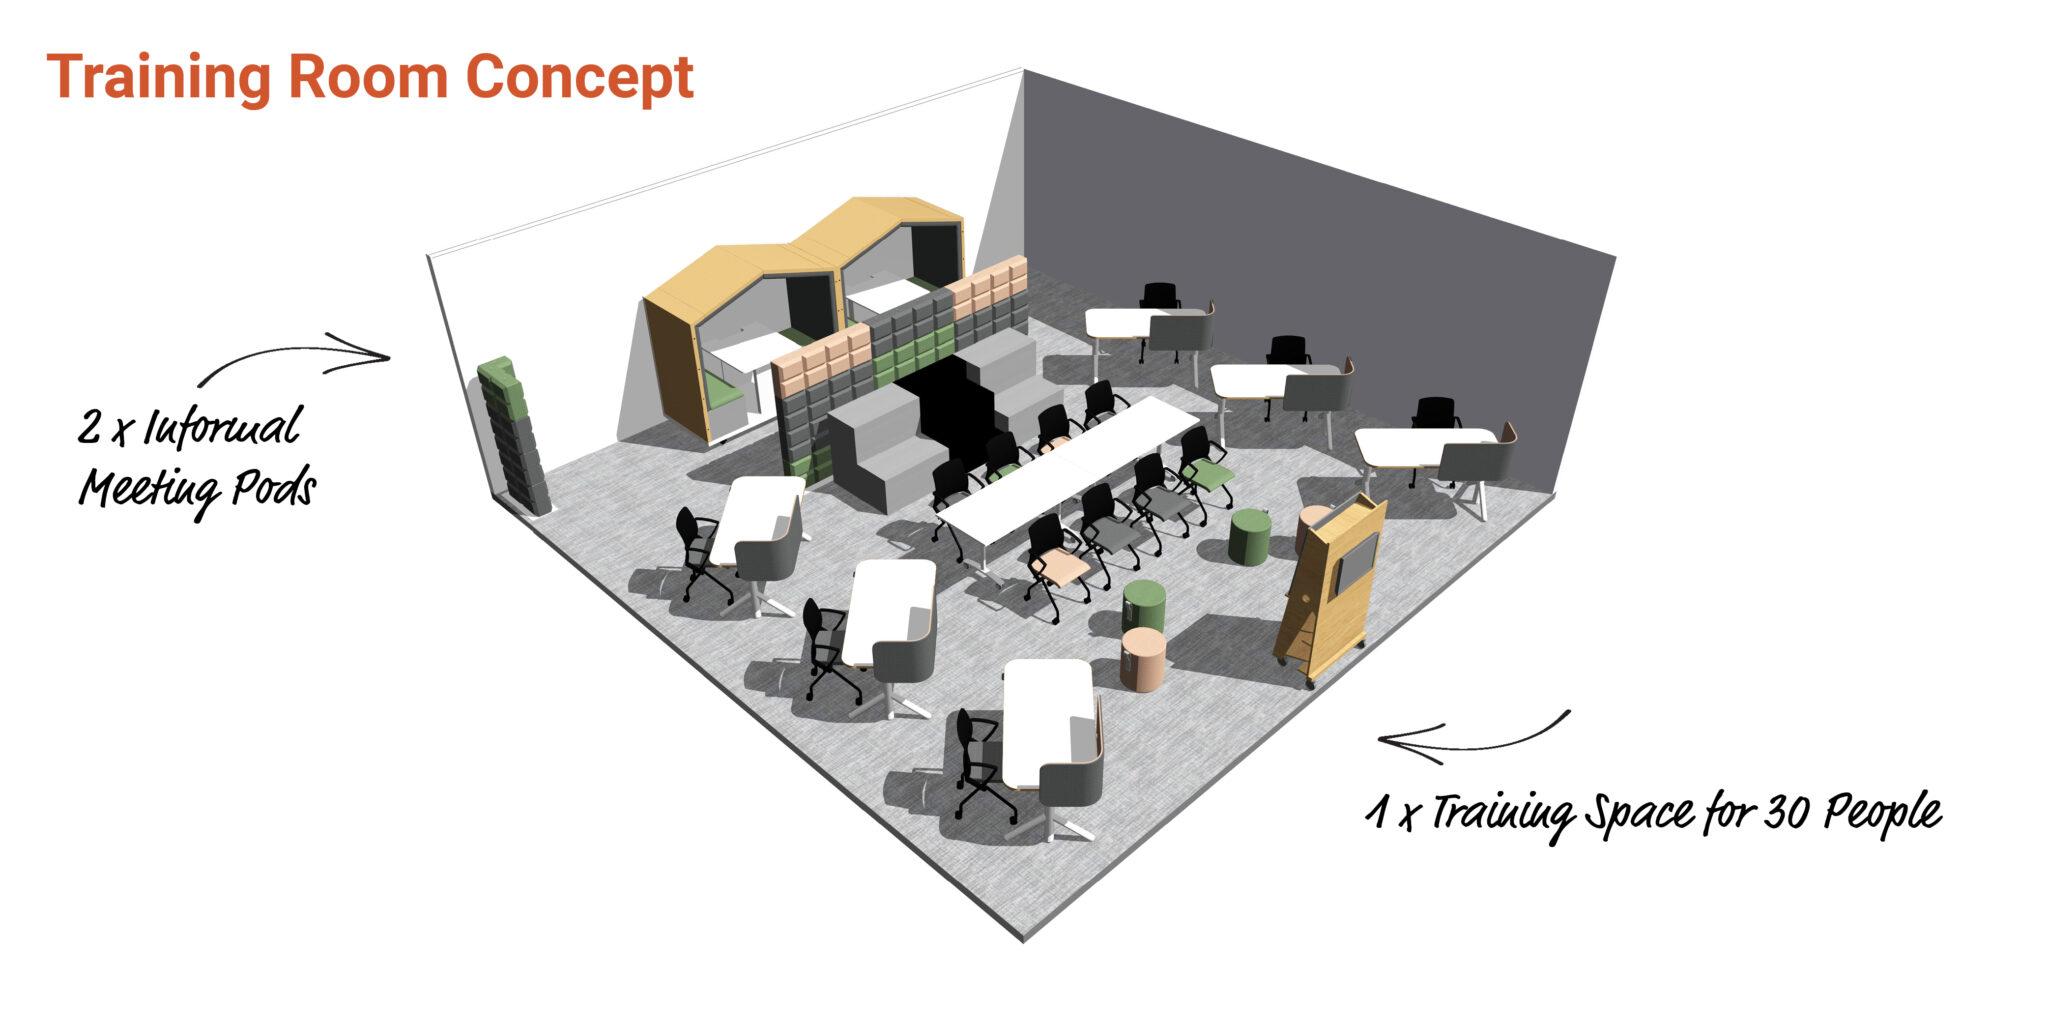 Training room concept